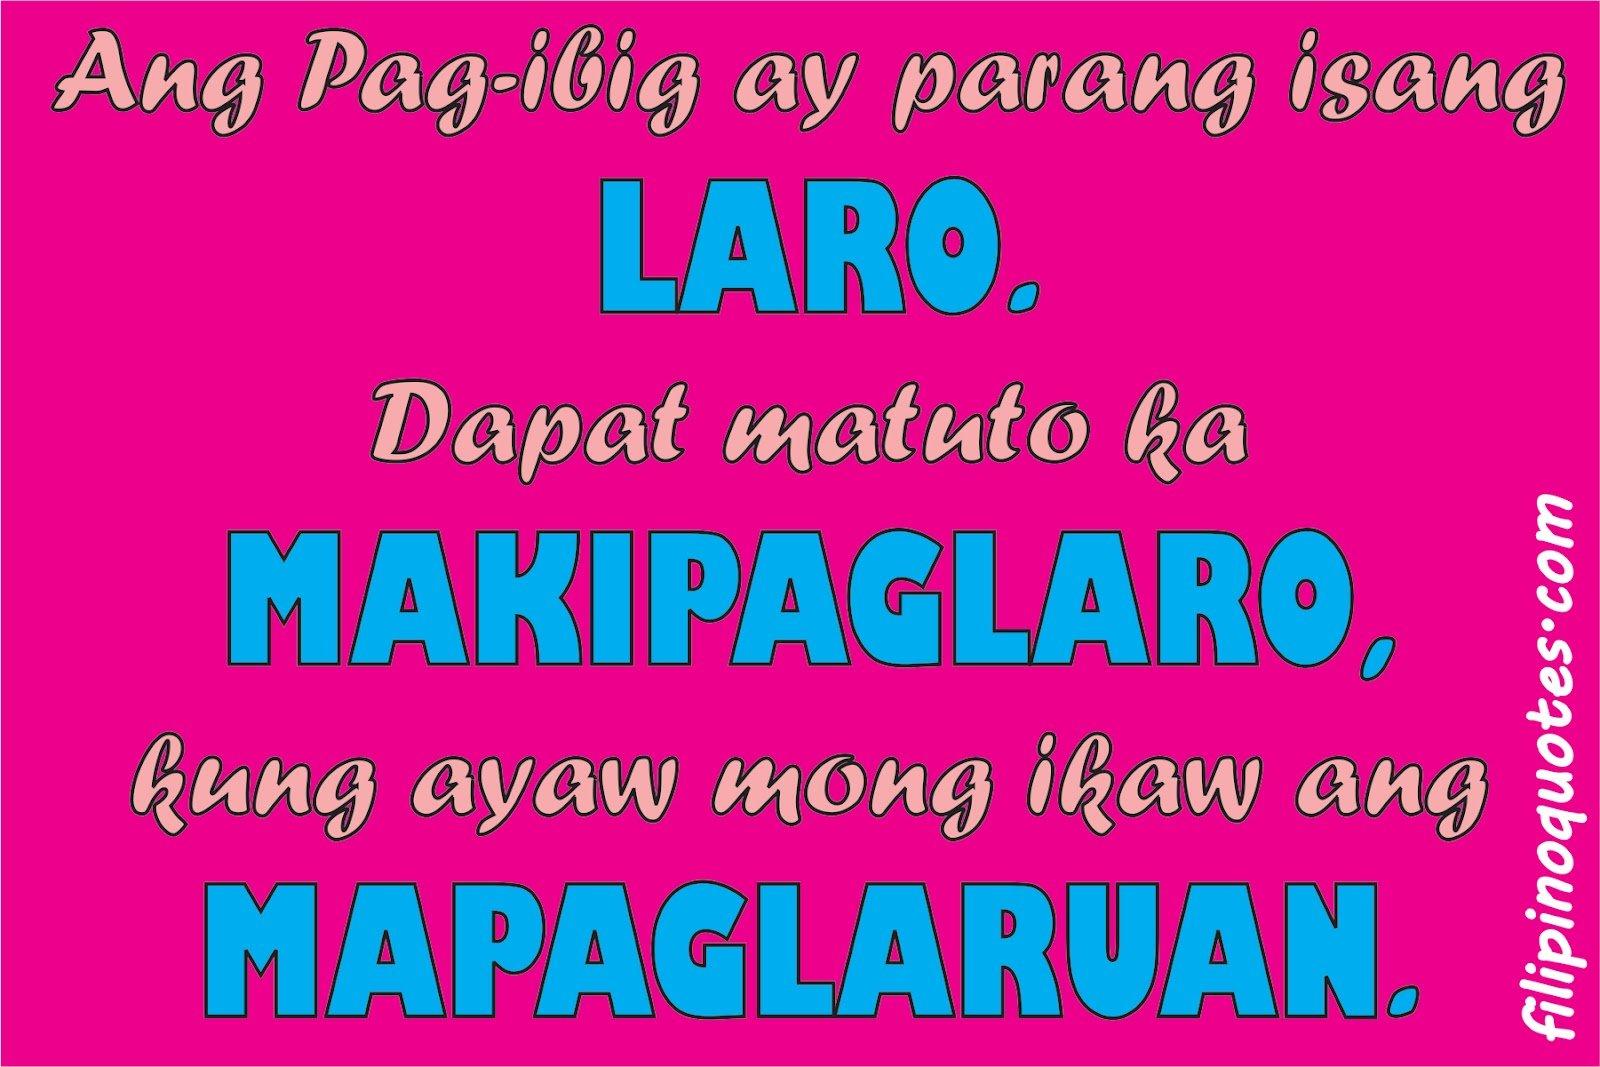 Joke Quotes Tagalog Sweet: Tagalog Life Quotes. QuotesGram